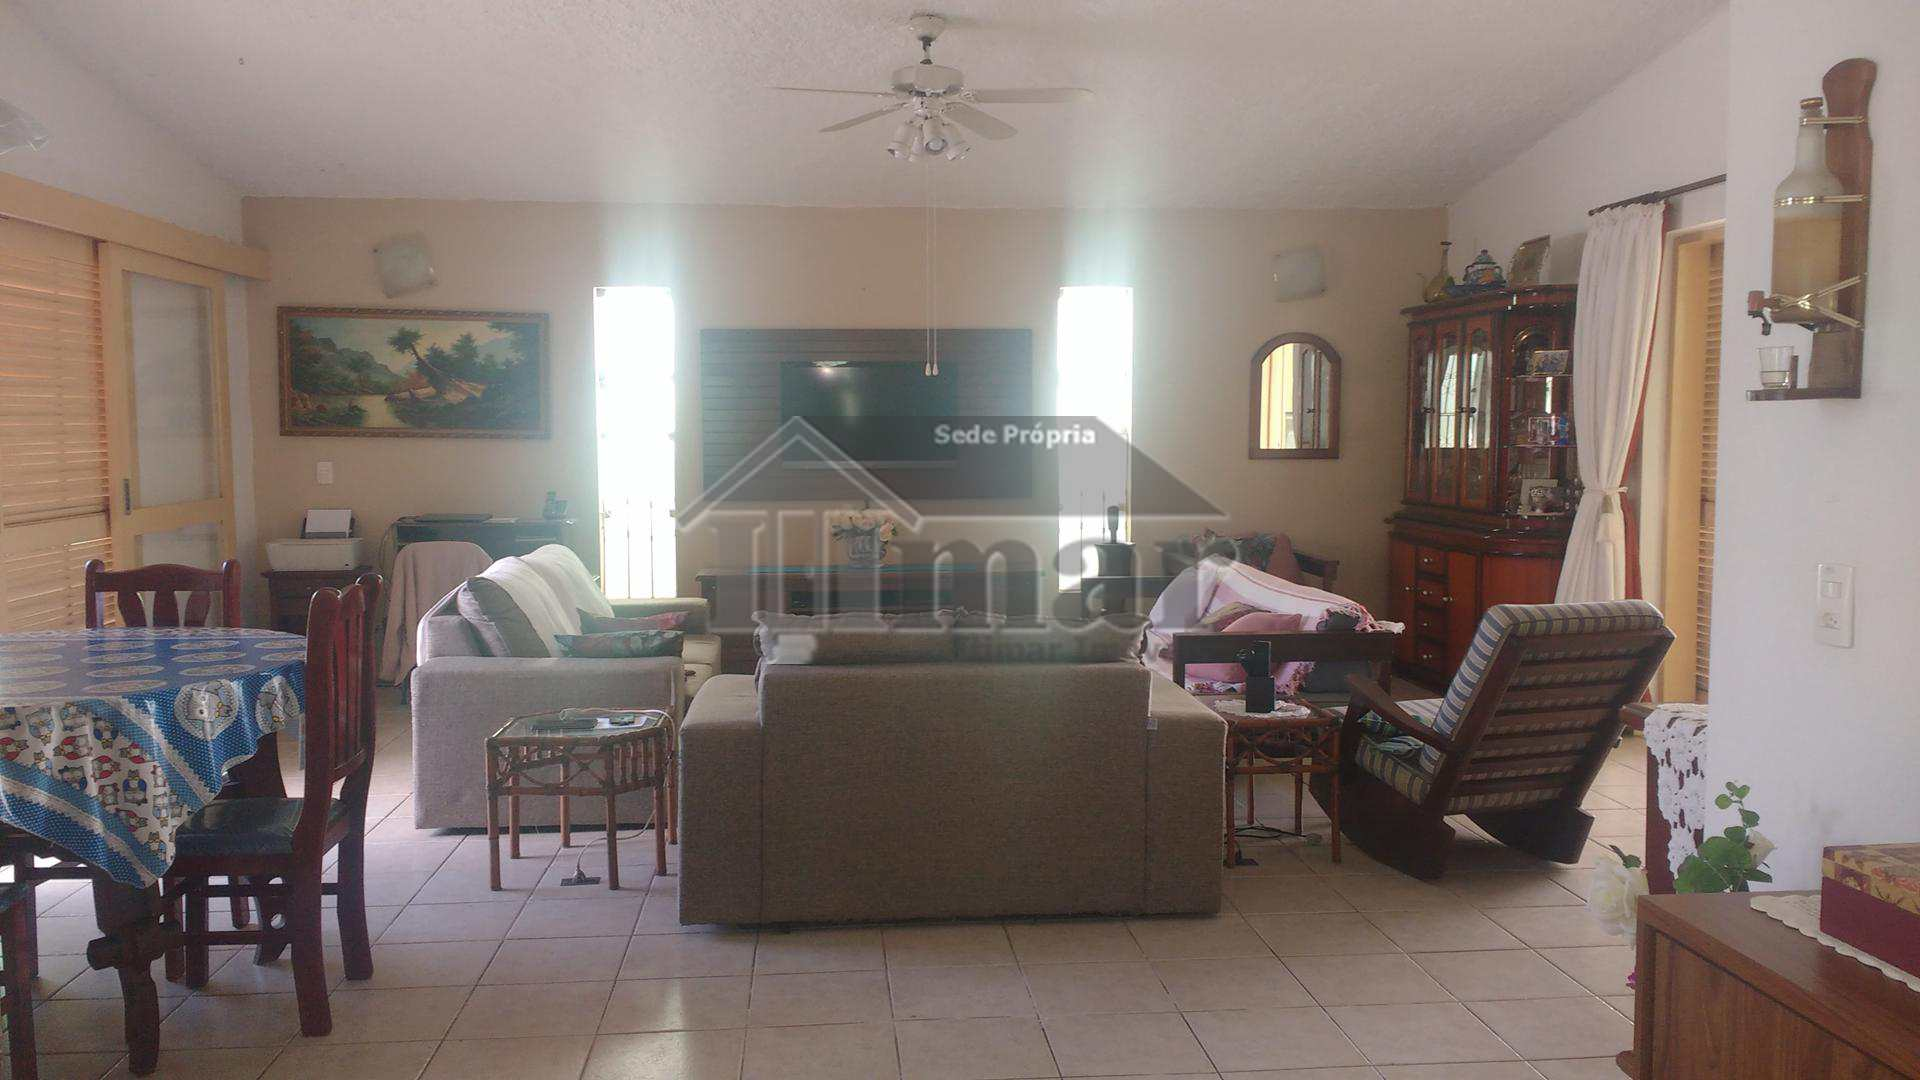 Casa com 4 dorms, Jardim Virgínia, Guarujá - R$ 750 mil, Cod: 4809